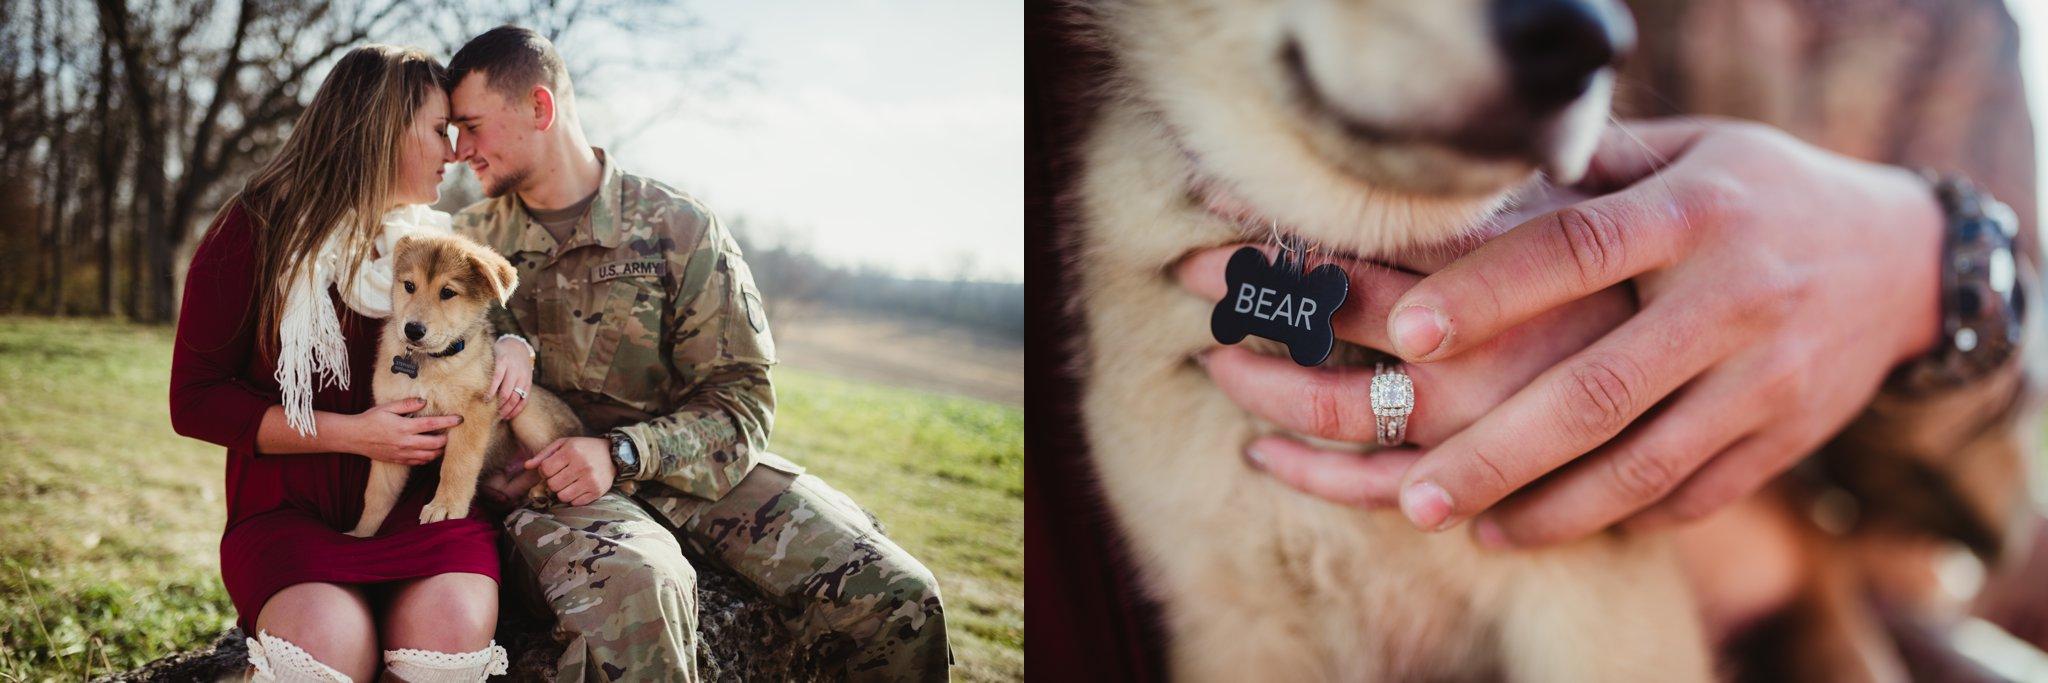 engagement photo military army german shepherd puppy.jpg